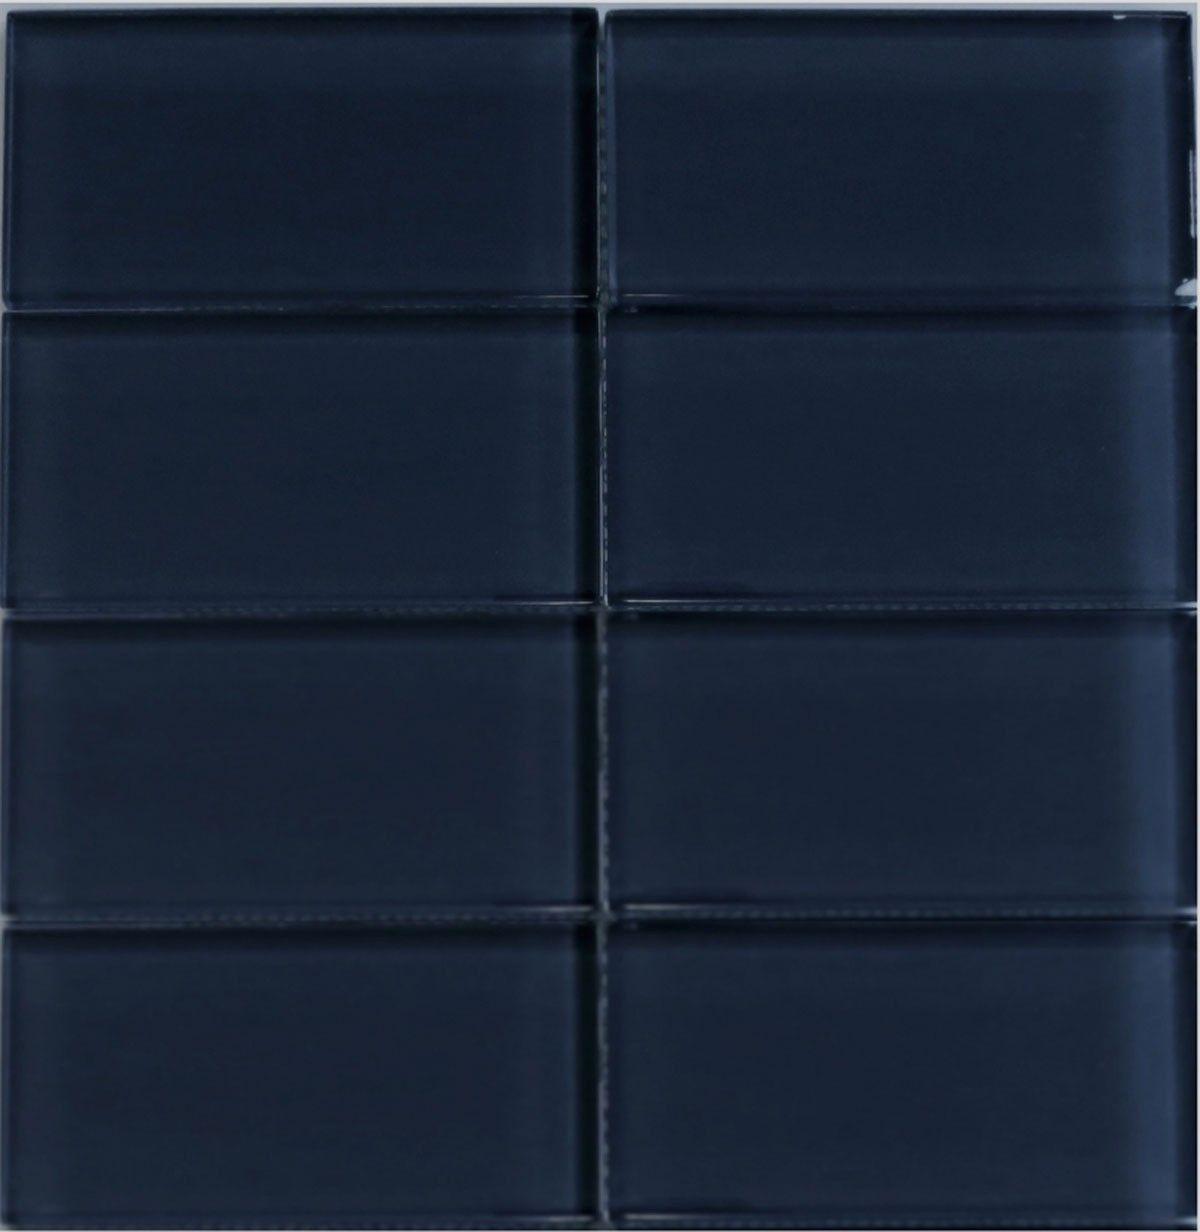 Lush 3x6 midnight dark blue glass subway tile subway tiles lush 3x6 midnight dark blue glass subway tile doublecrazyfo Gallery